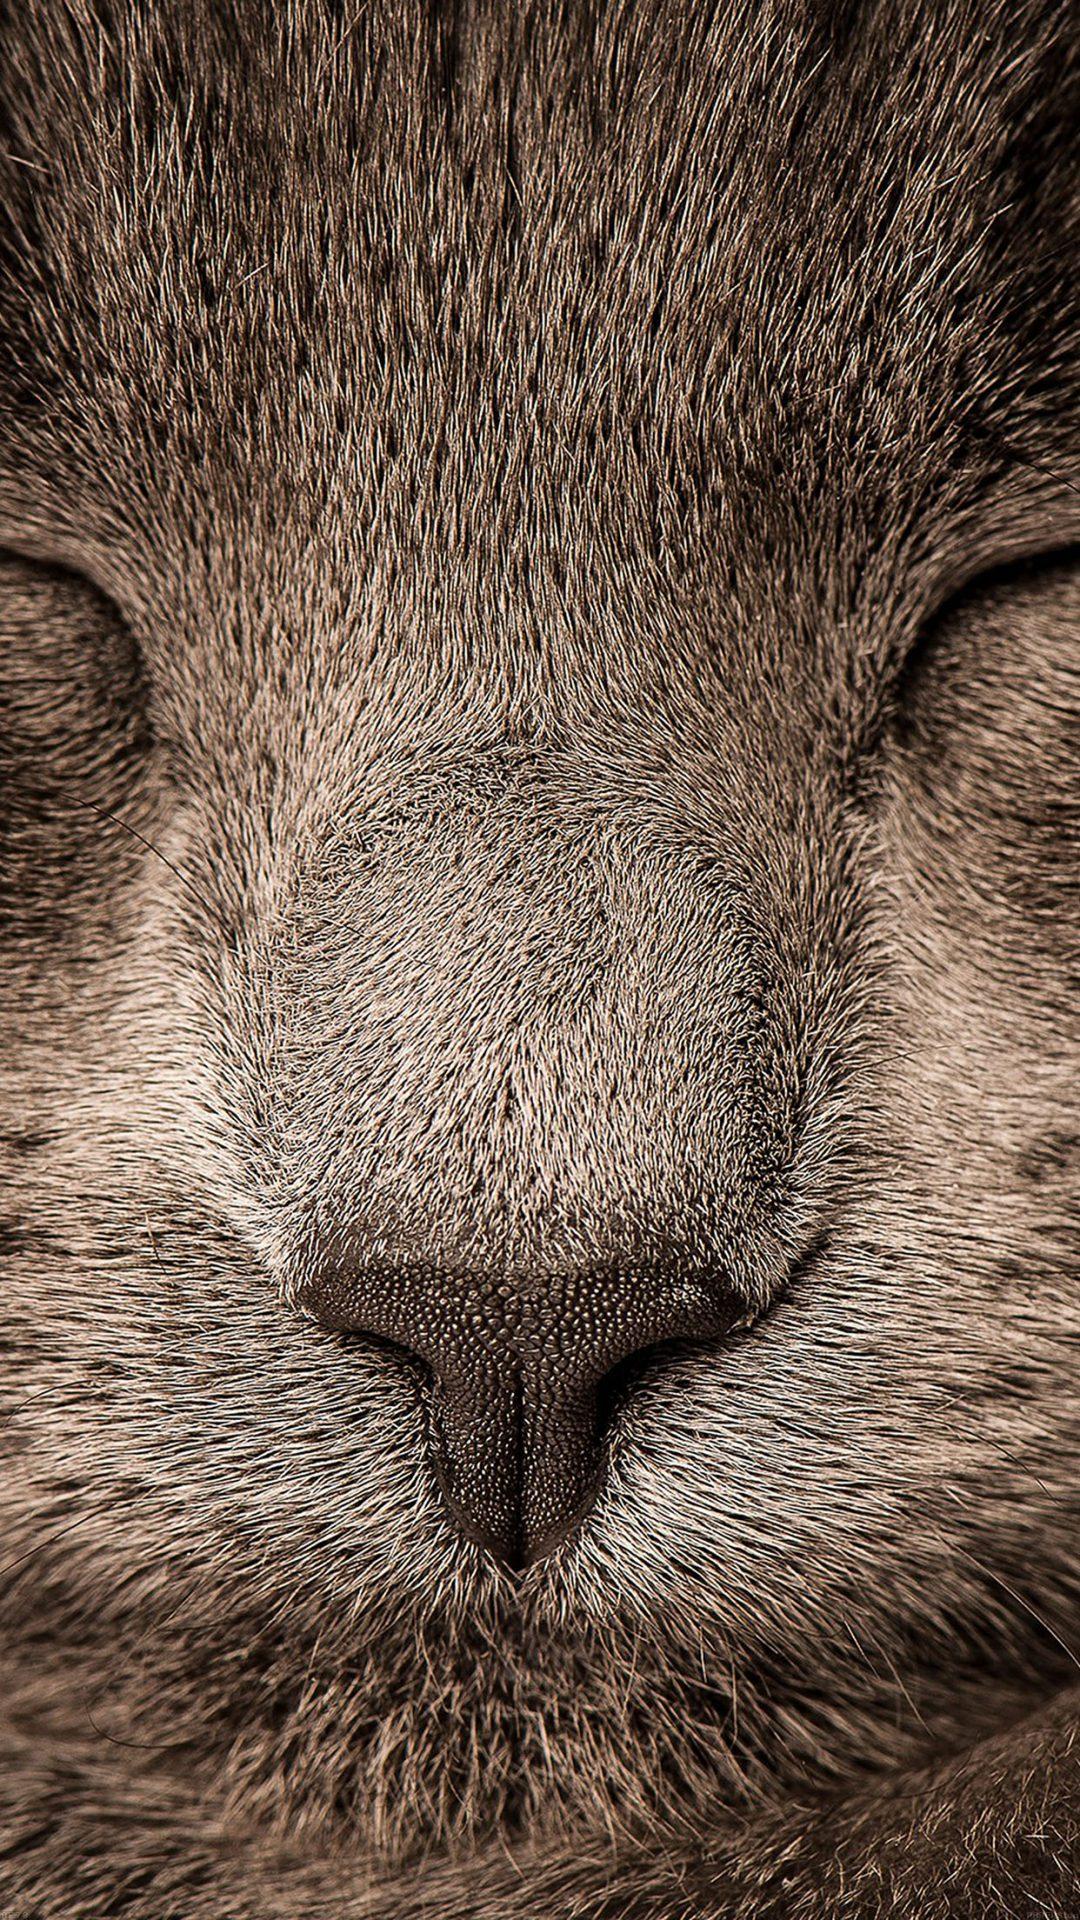 Sleeping Cat Zoom Nature